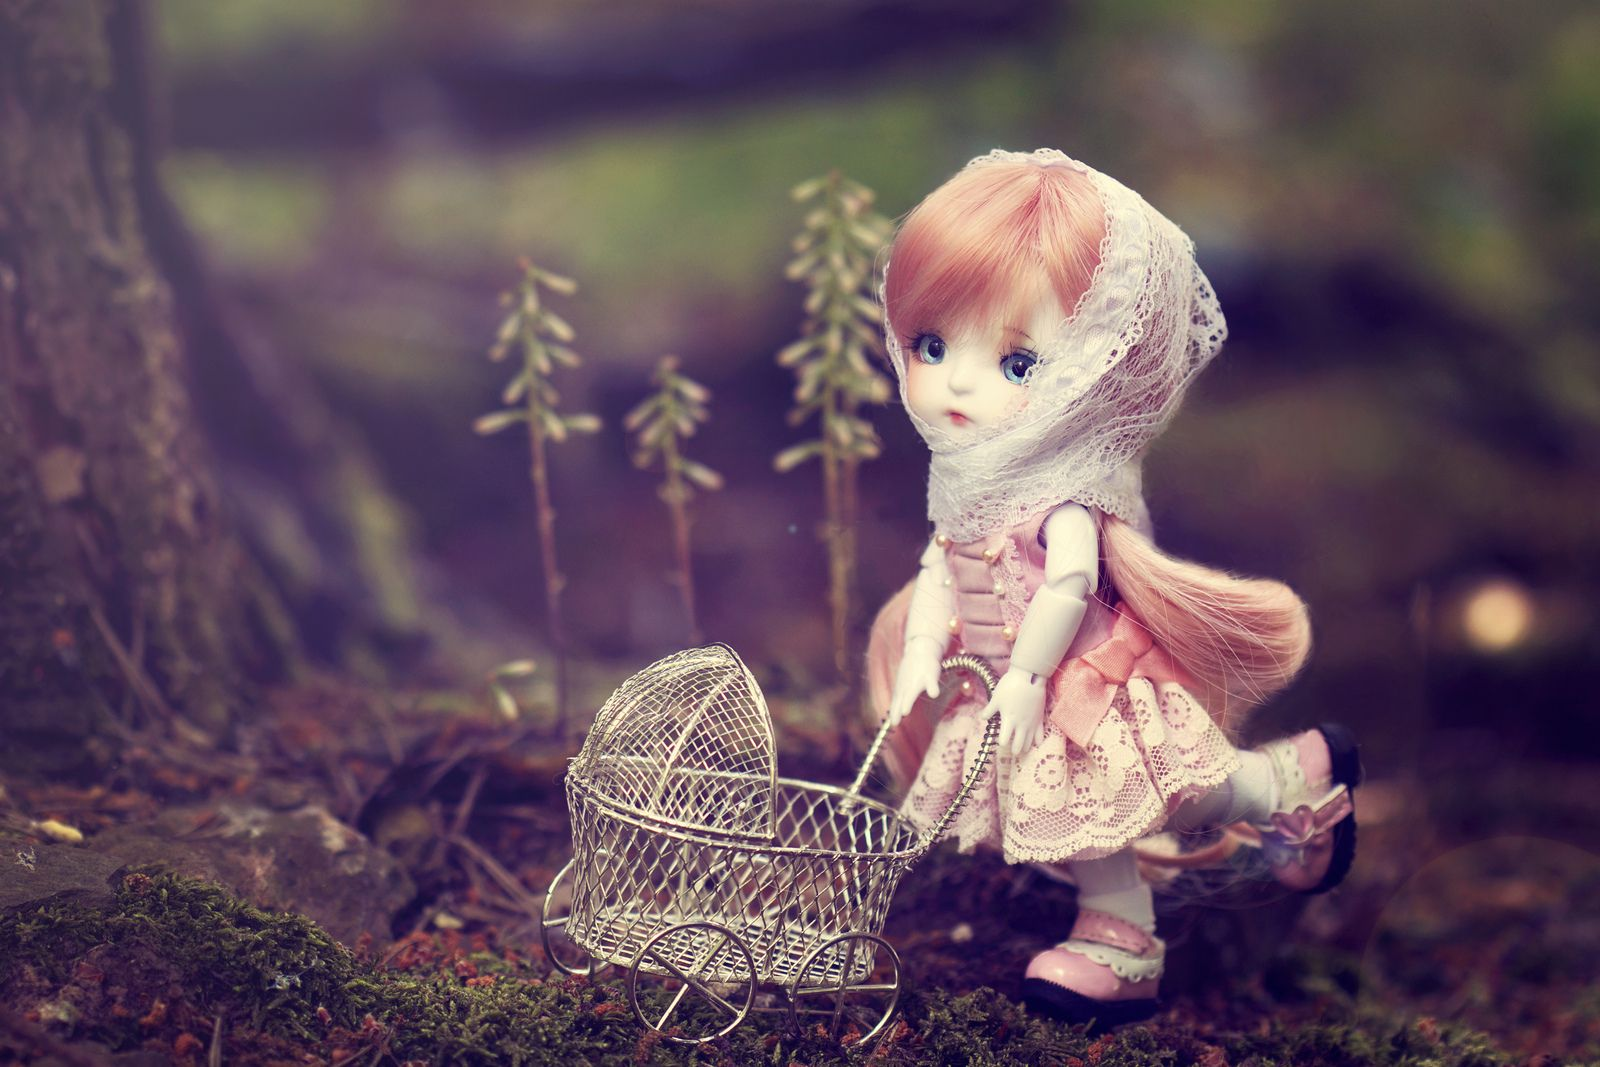 Go On An Adventure Cute Laptop Wallpaper Cute Love Images Cute Dolls Cute doll cute barbie dolls desktop